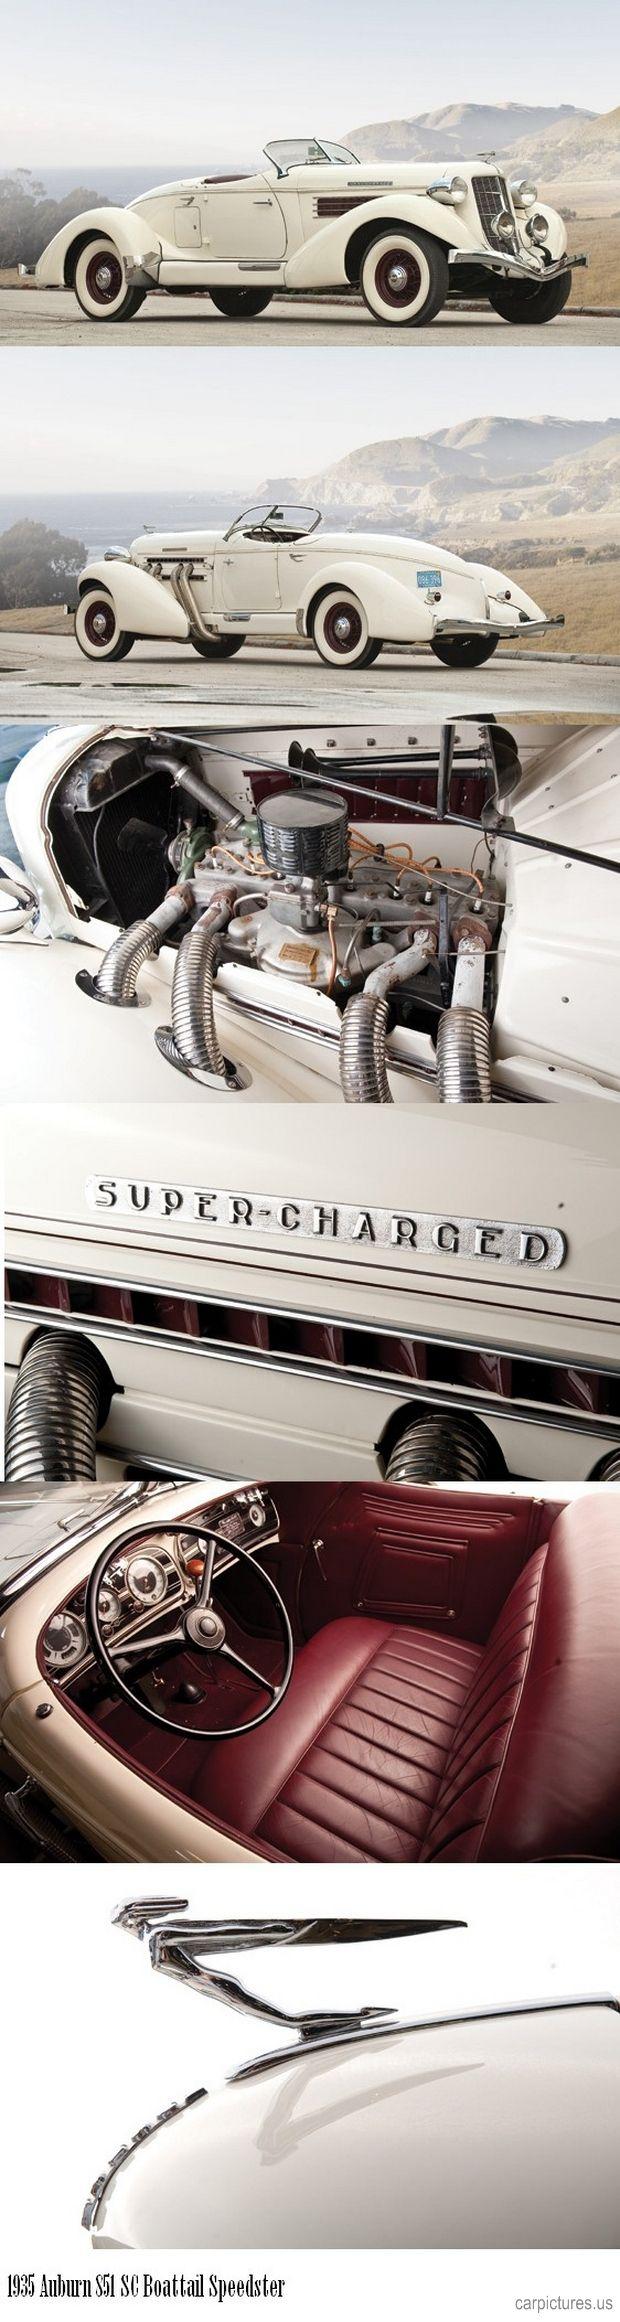 1935 Auburn 851 SC Boattail Speedster ps http://www.amazon.com/gp/product/B00RZ1TKYE